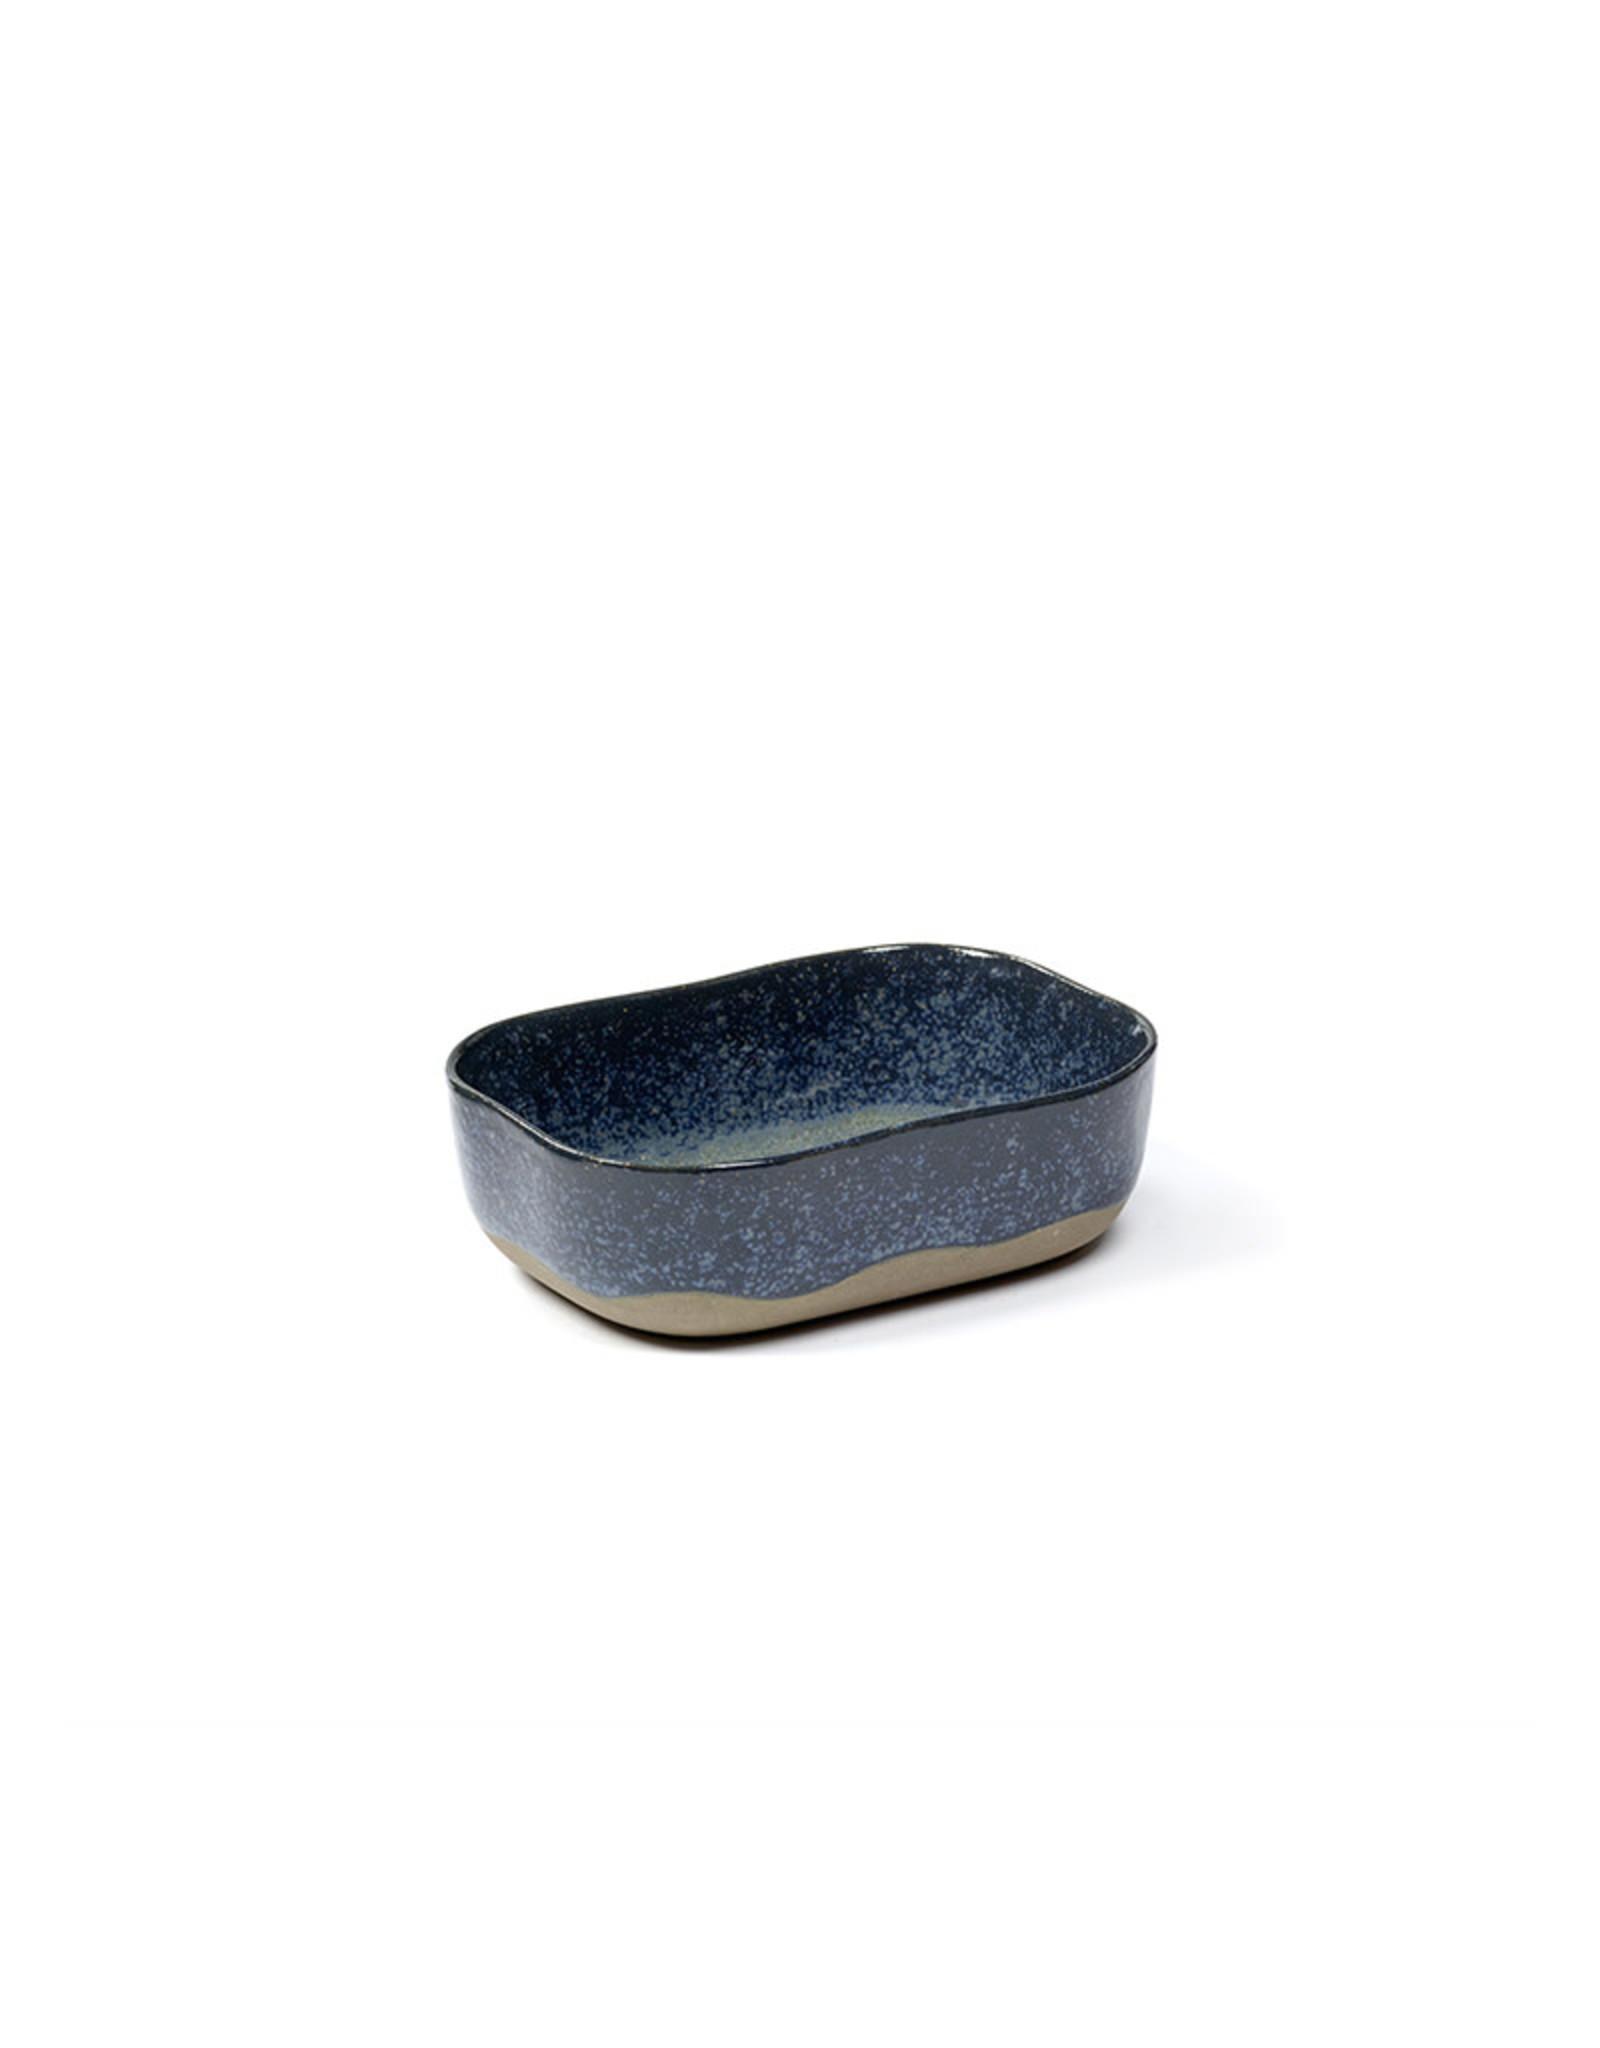 SERAX SERAX MERCI PLATE N° 6 BLUE